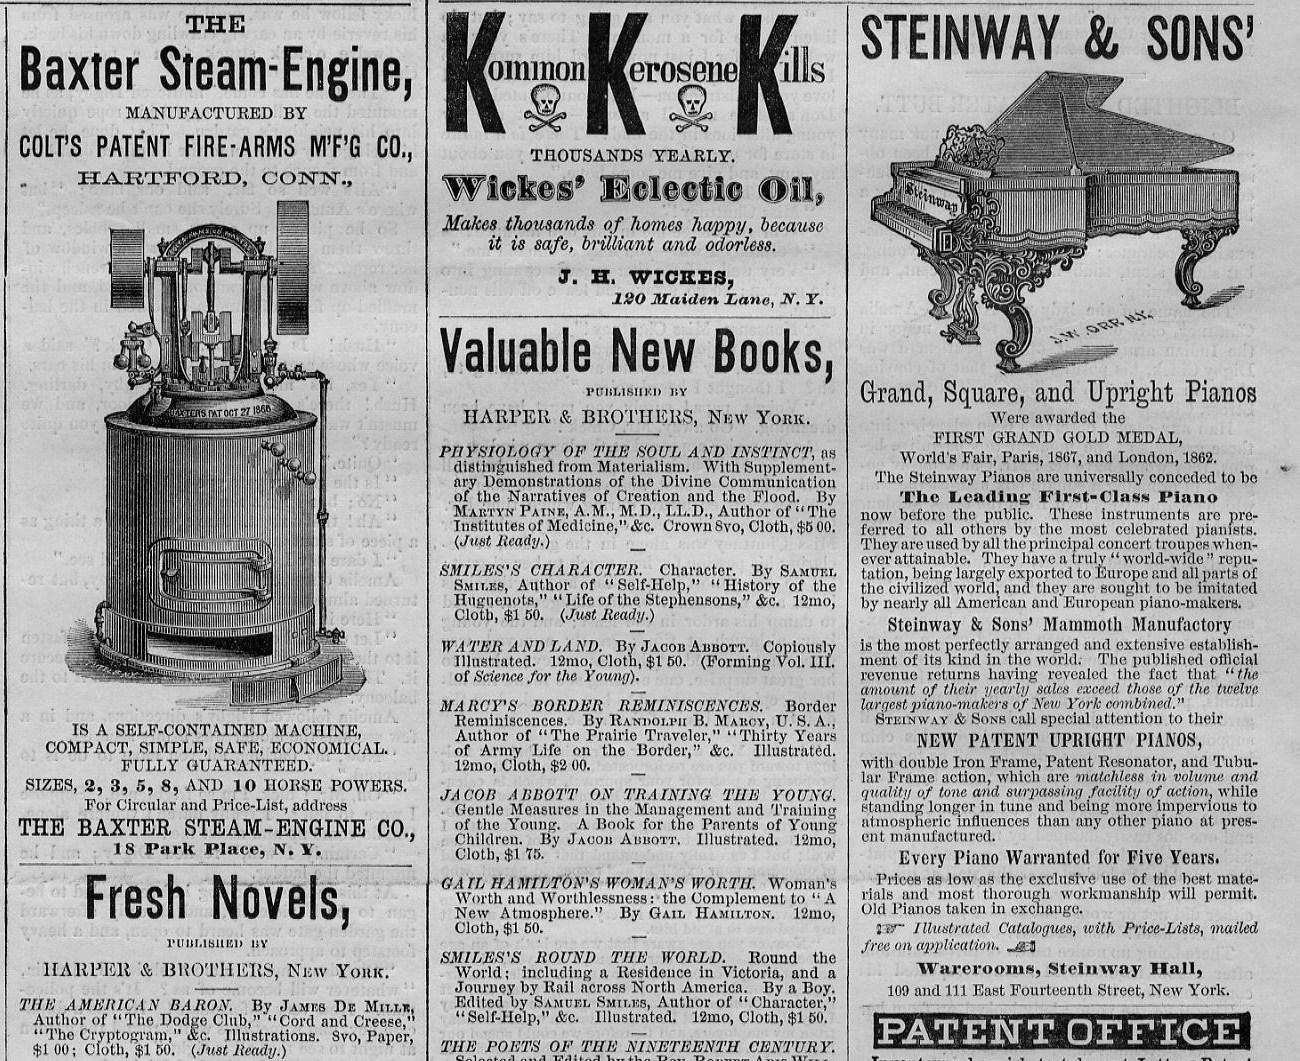 STEAM PARK PLACE NEW YORK BAXTER STEAM ENGINE ANTIQUE 1873 ADVERTISEMENT